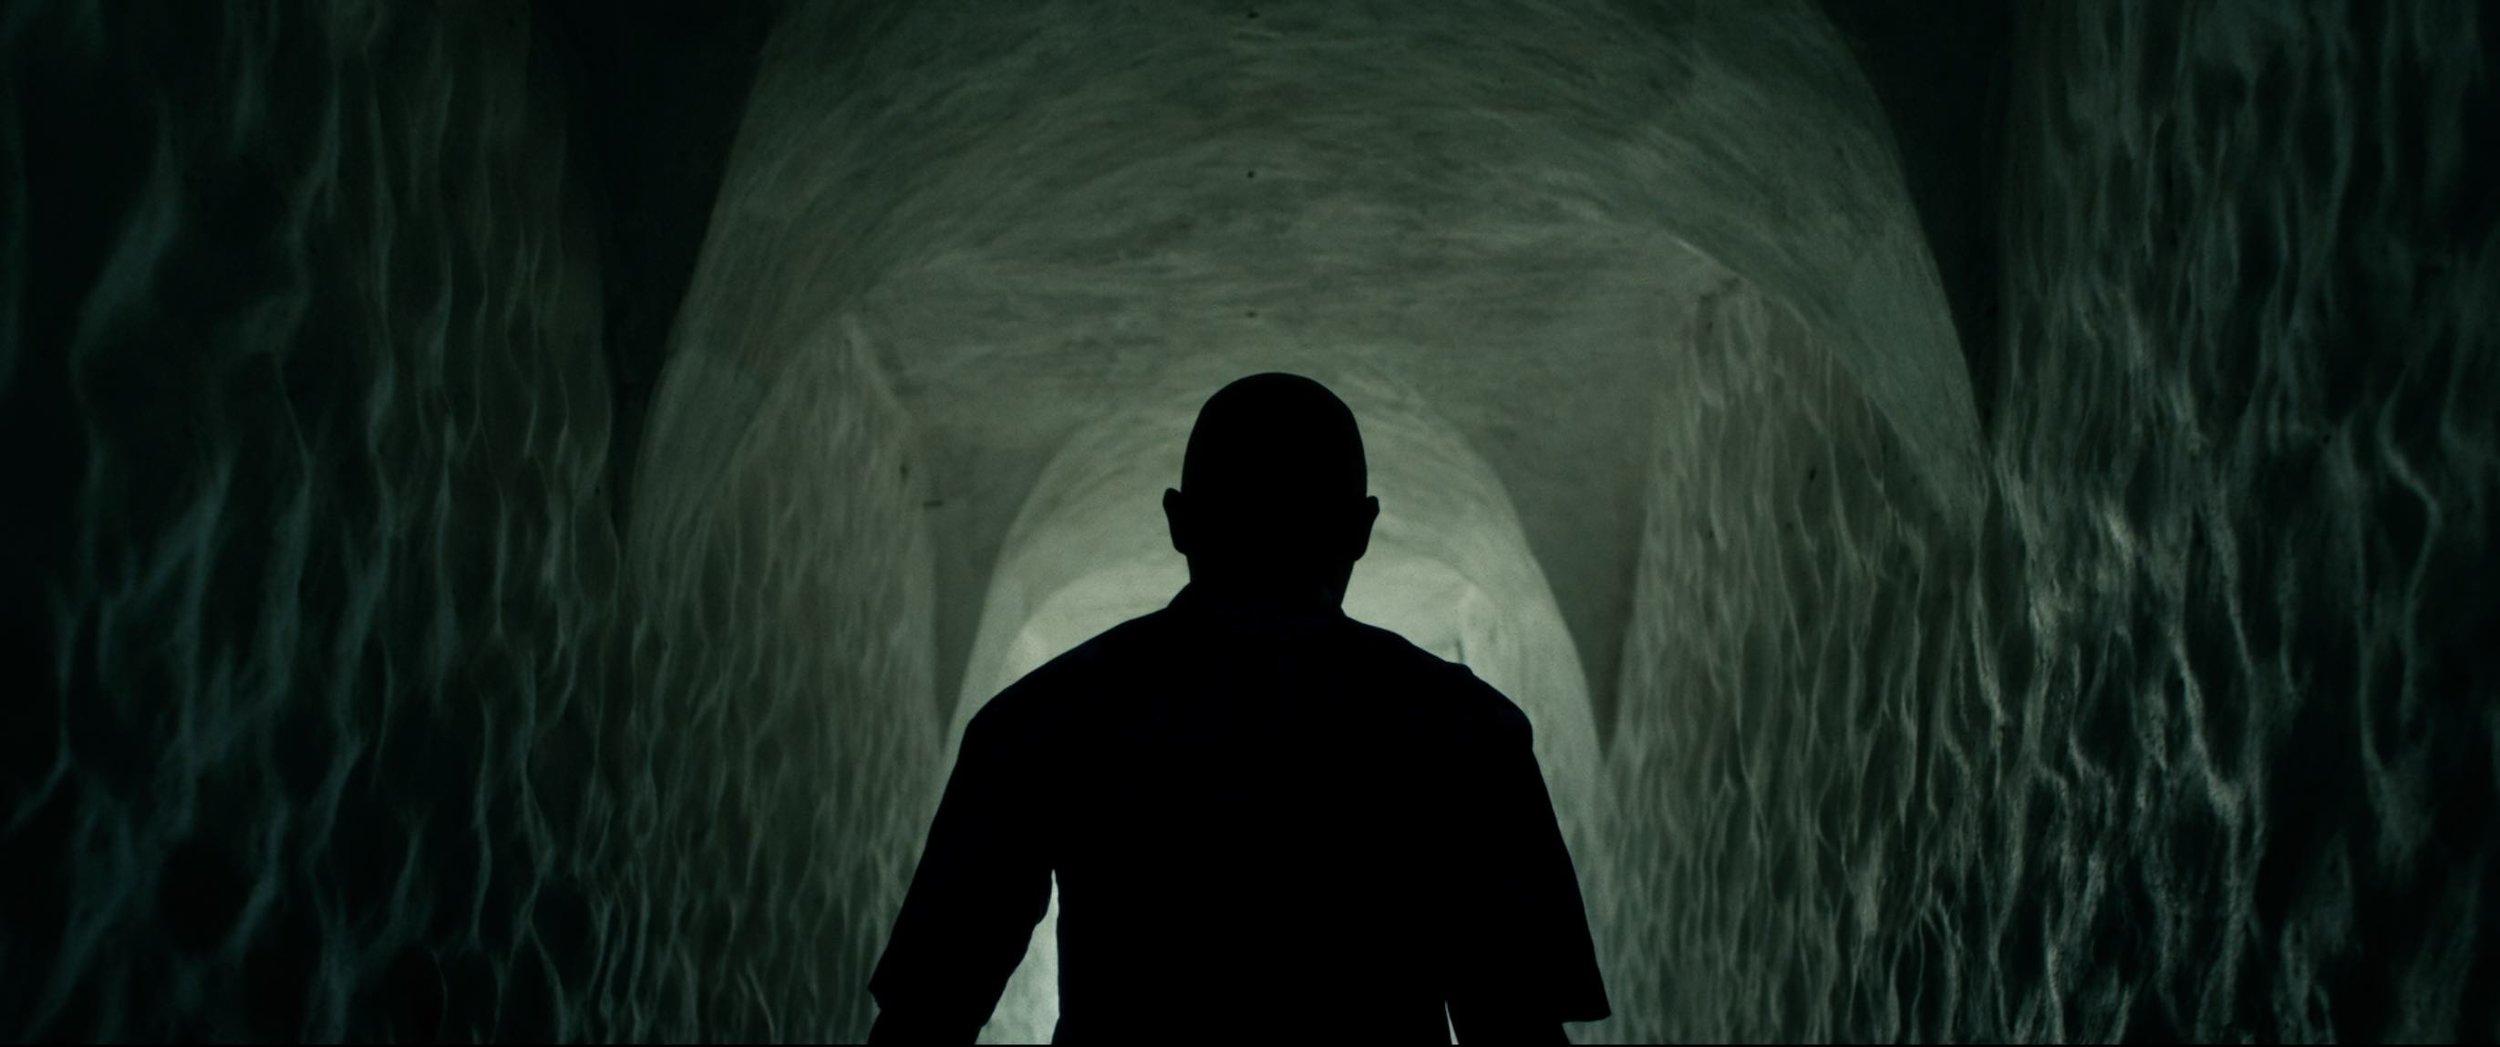 henry corridor shadow.jpg